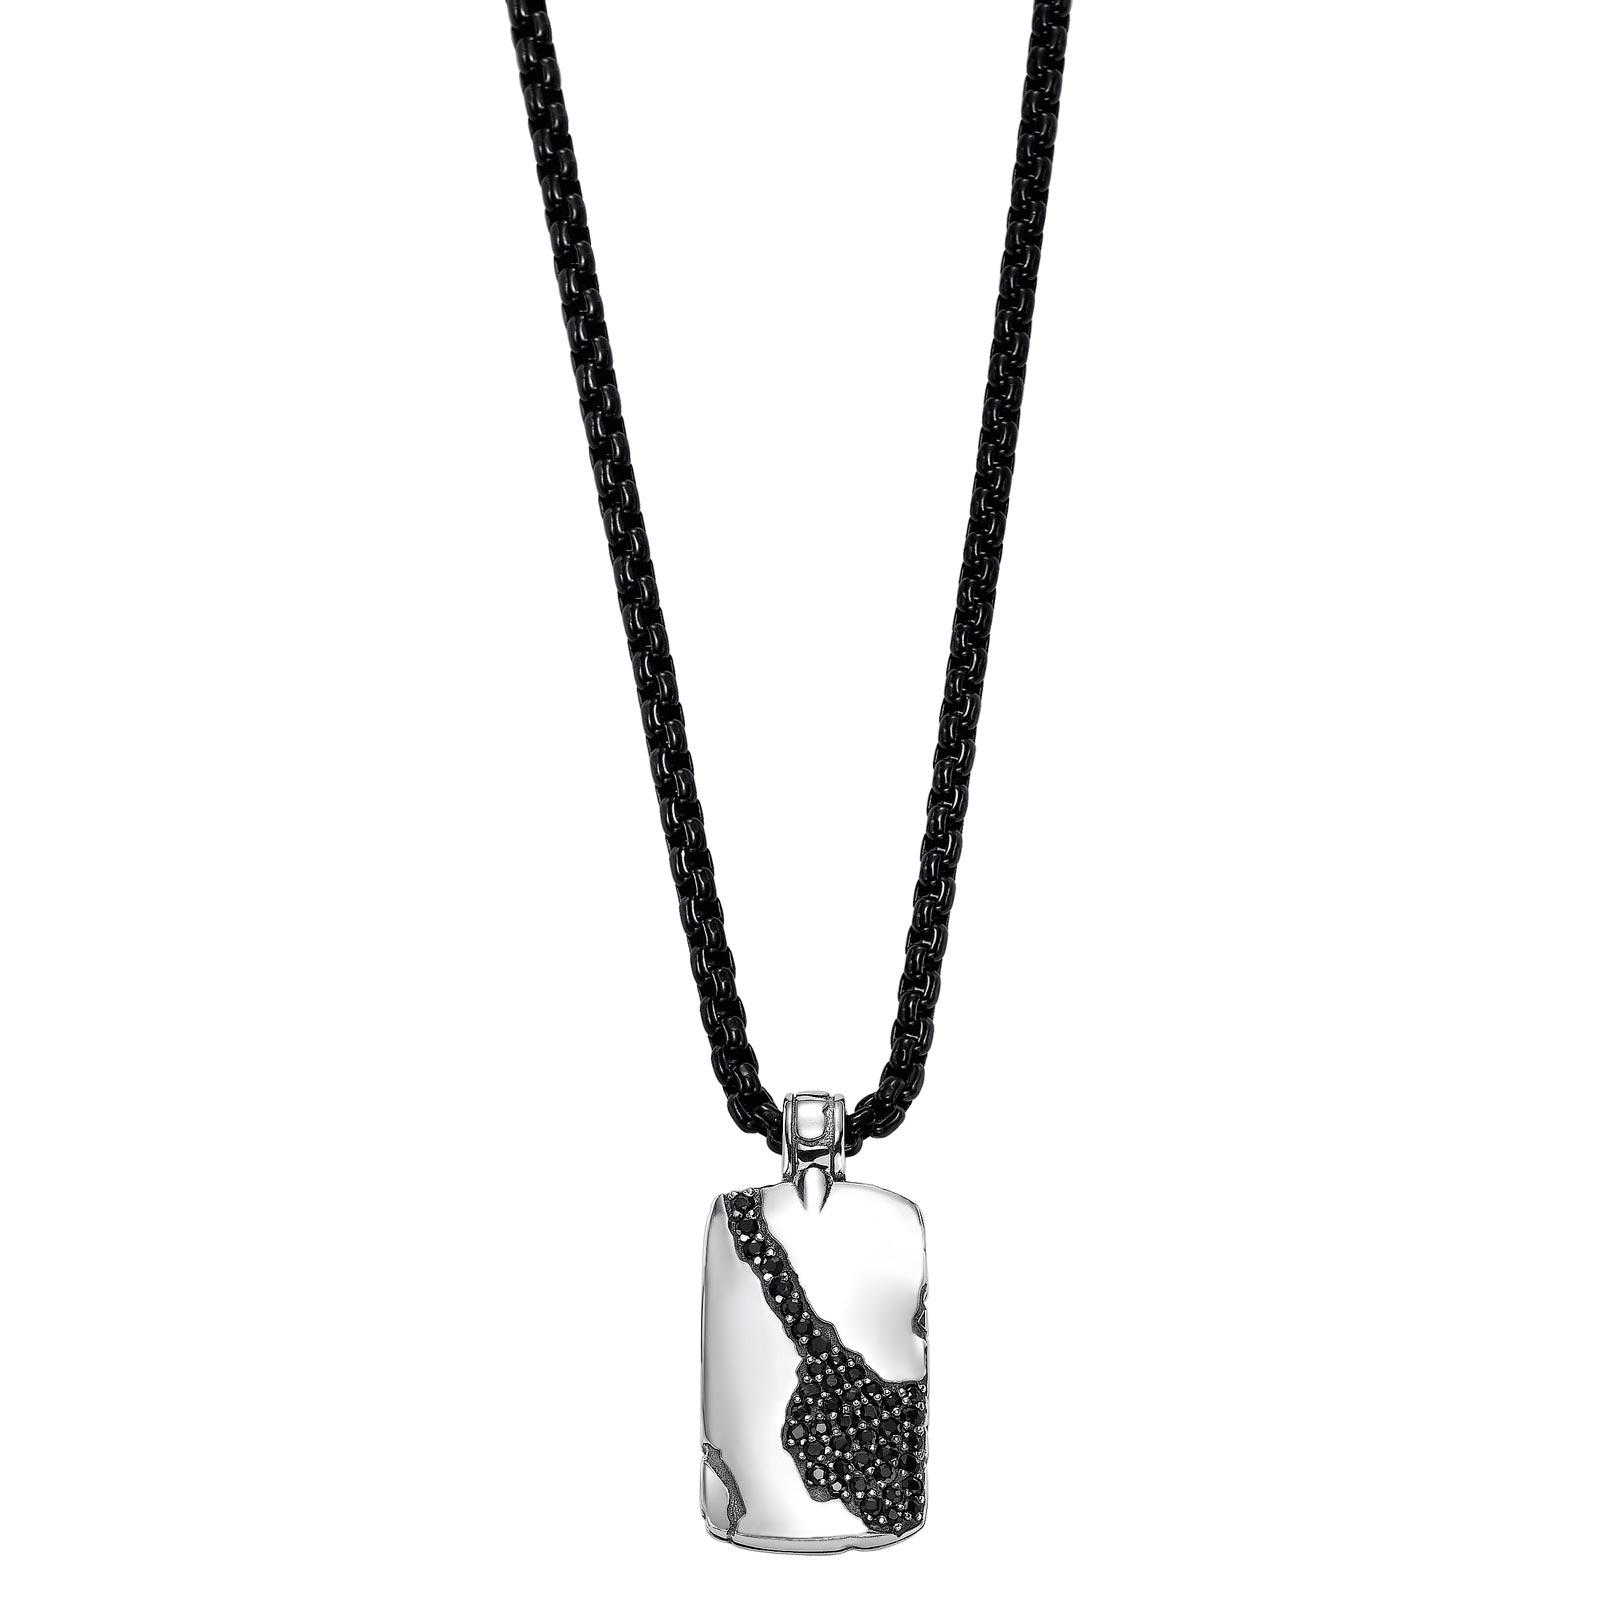 Triton necklace pendants 67 5261 g01 long island ny triton triton necklace pendants 67 5261 g01 aloadofball Images